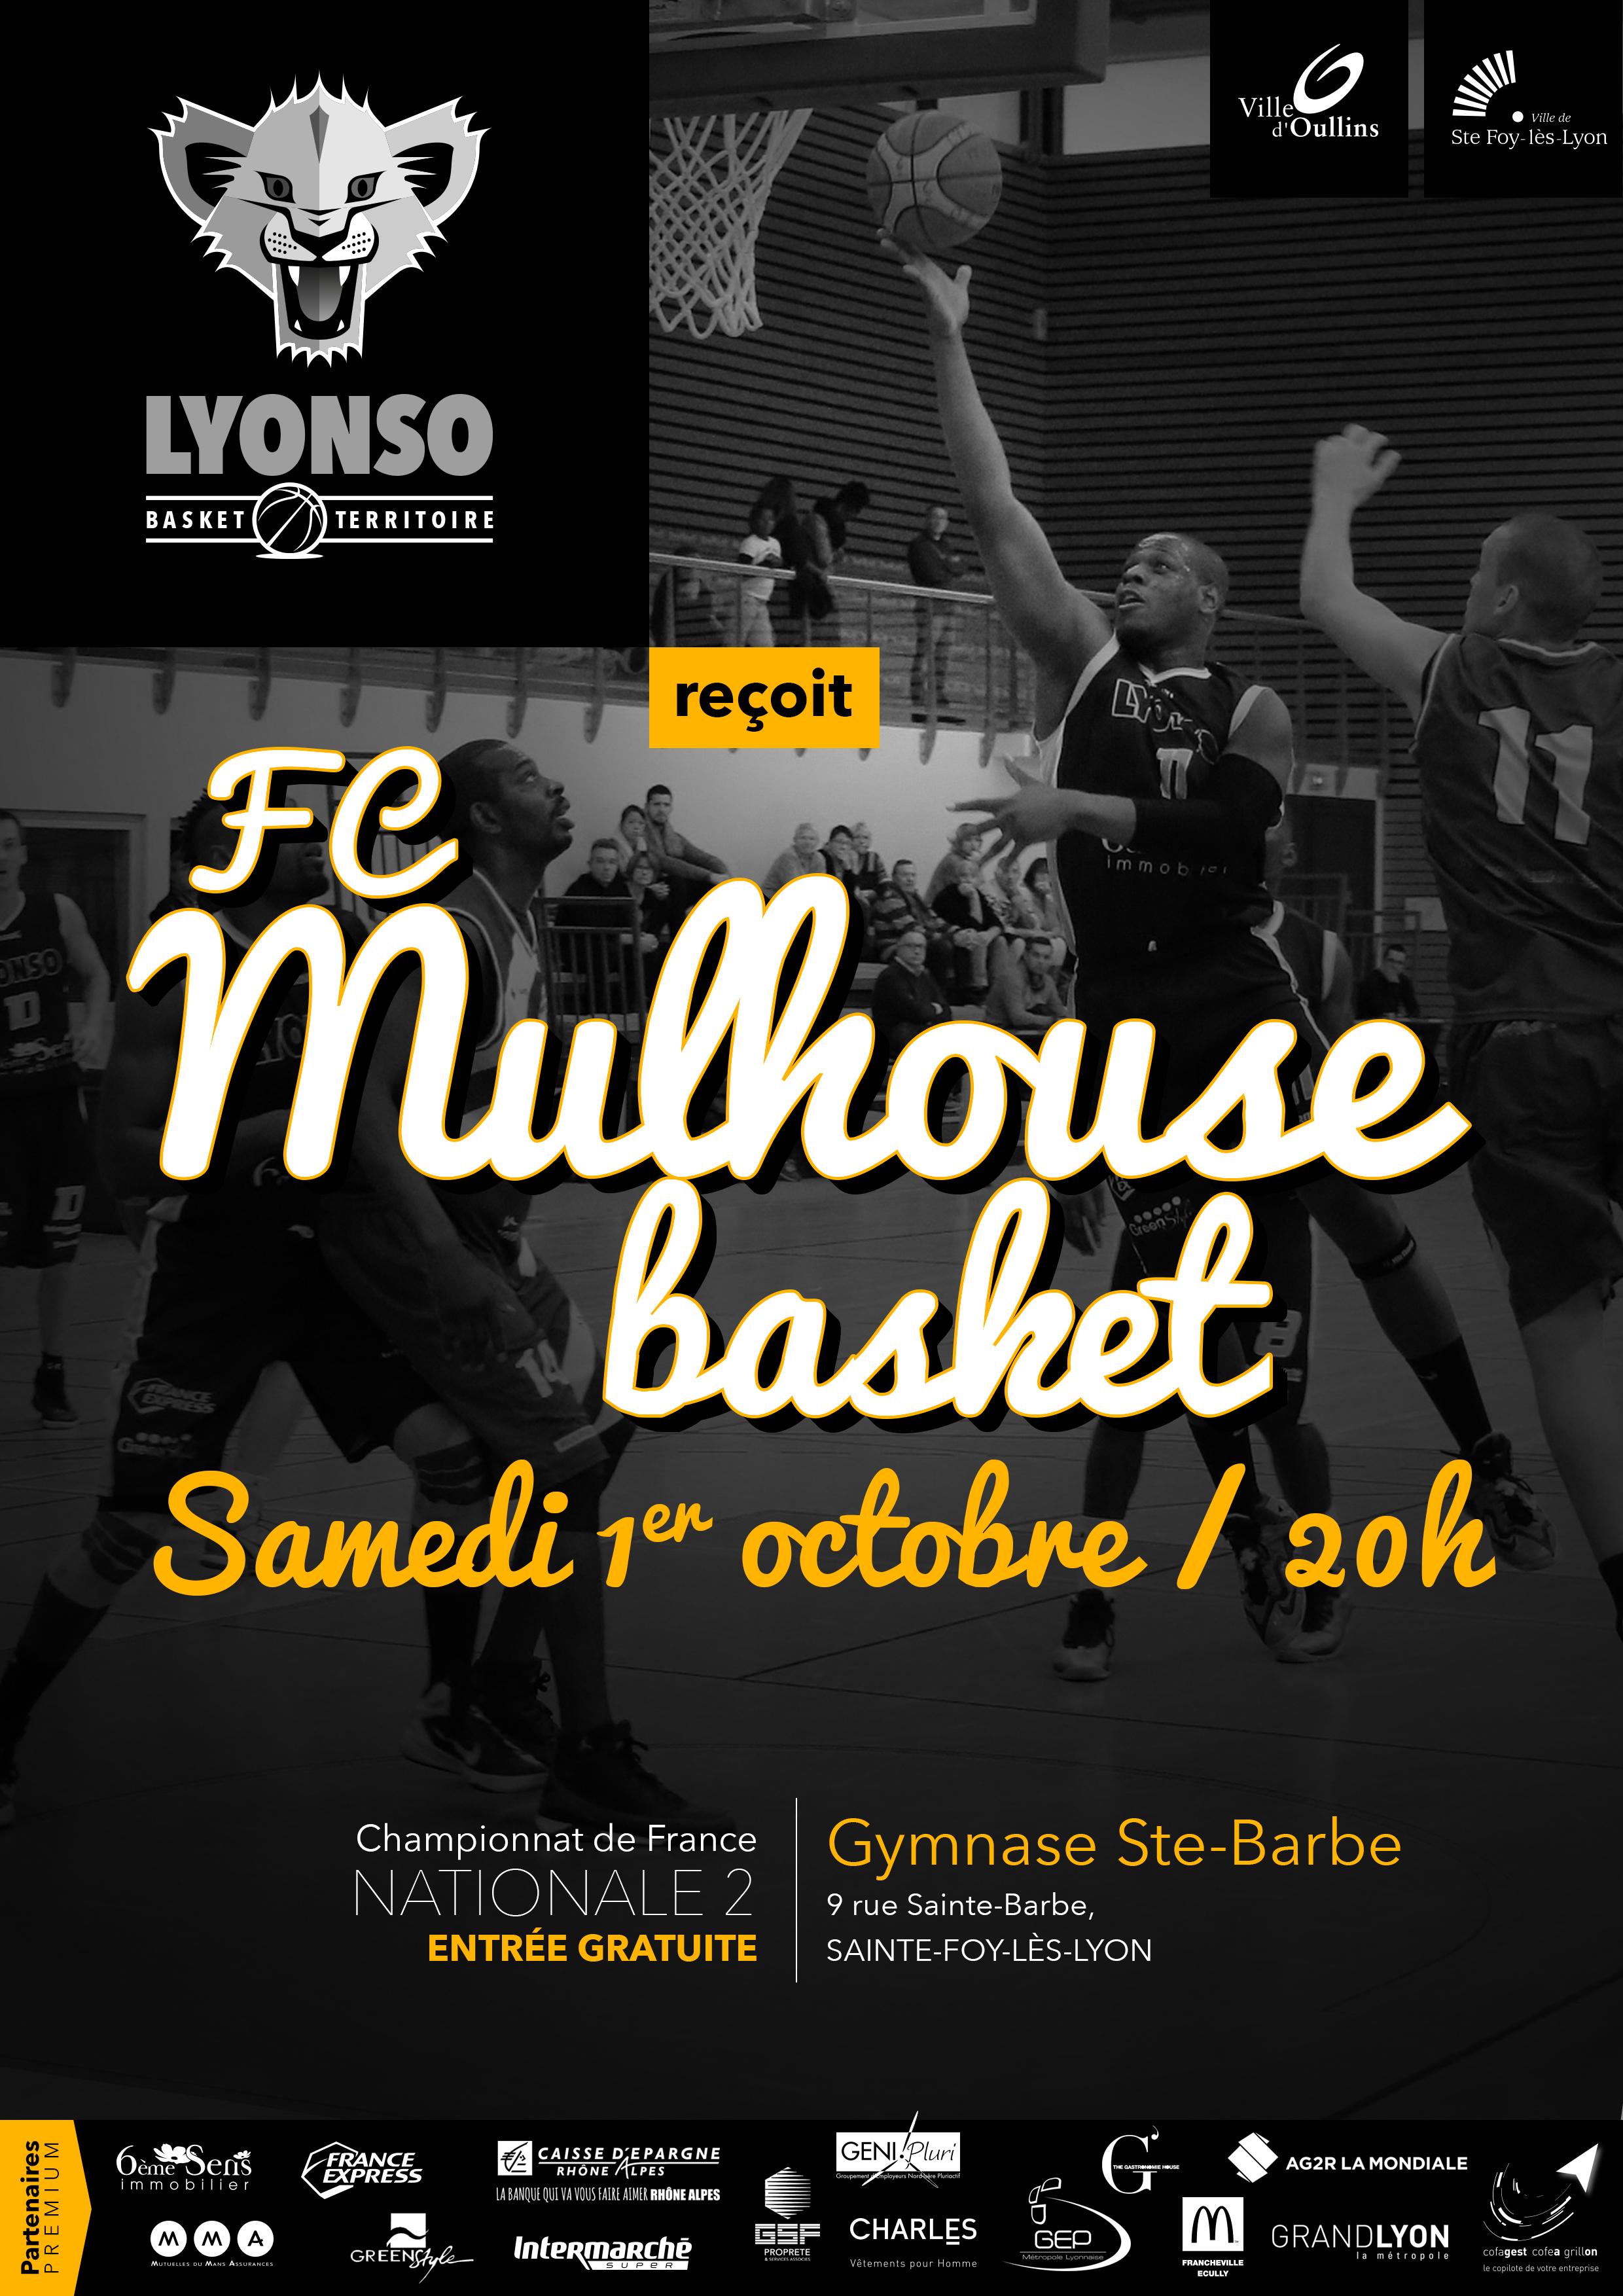 [J.03] IE Oullins Ste Foy Basket-Ball - FC MULHOUSE : 85 - 73 2_-_Saison16-17_02_MULHOUSE